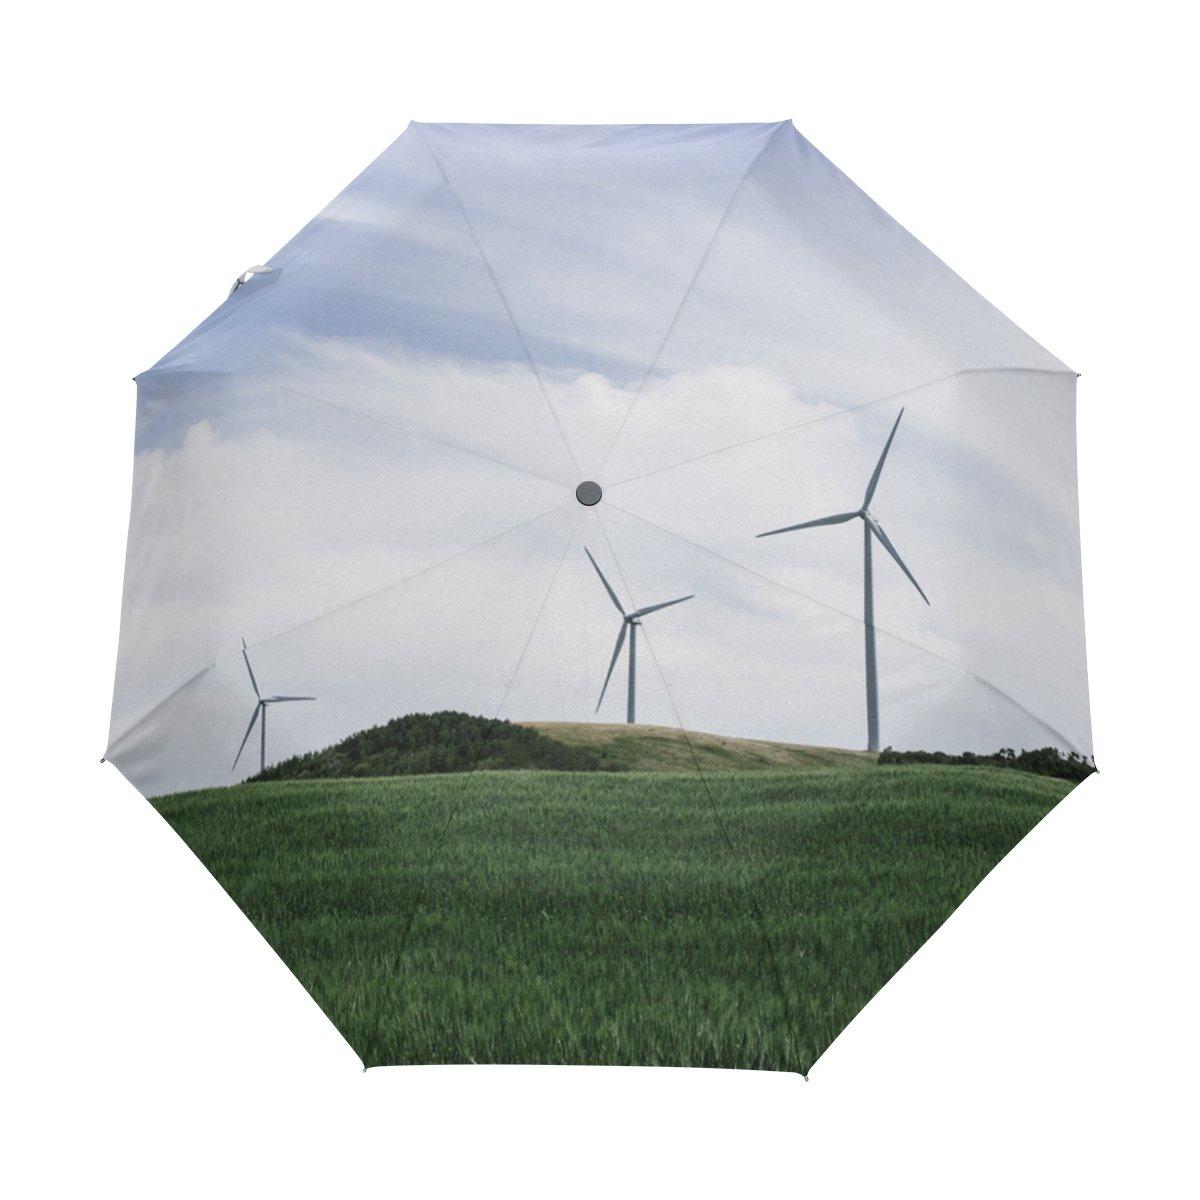 Senya Saobao防風と防雨トラベル傘with自動開いて閉じFolding風車Meadowブルースカイポータブル折りたたみ式太陽雨傘   B07FP496SS